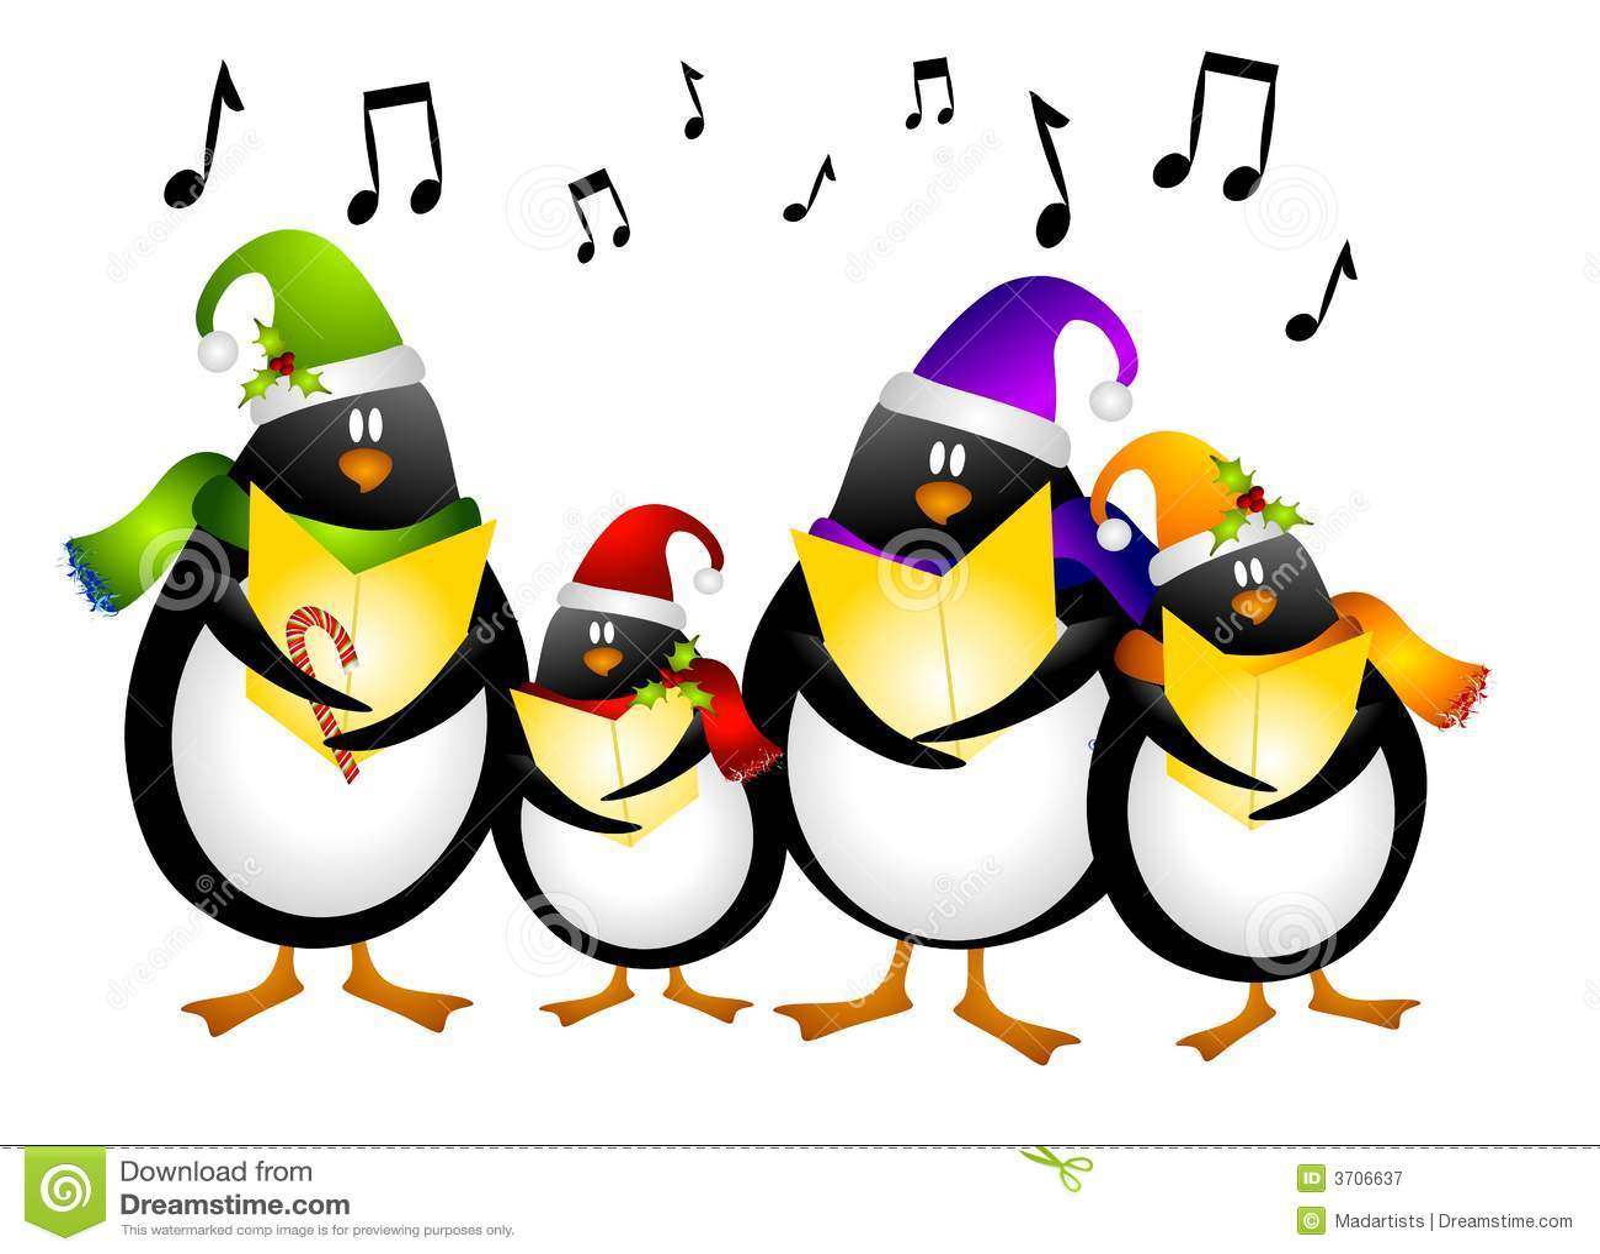 singing penguin christmas carolers stock illustration illustration rh dreamstime com christmas carolers clipart victorian christmas carolers clipart